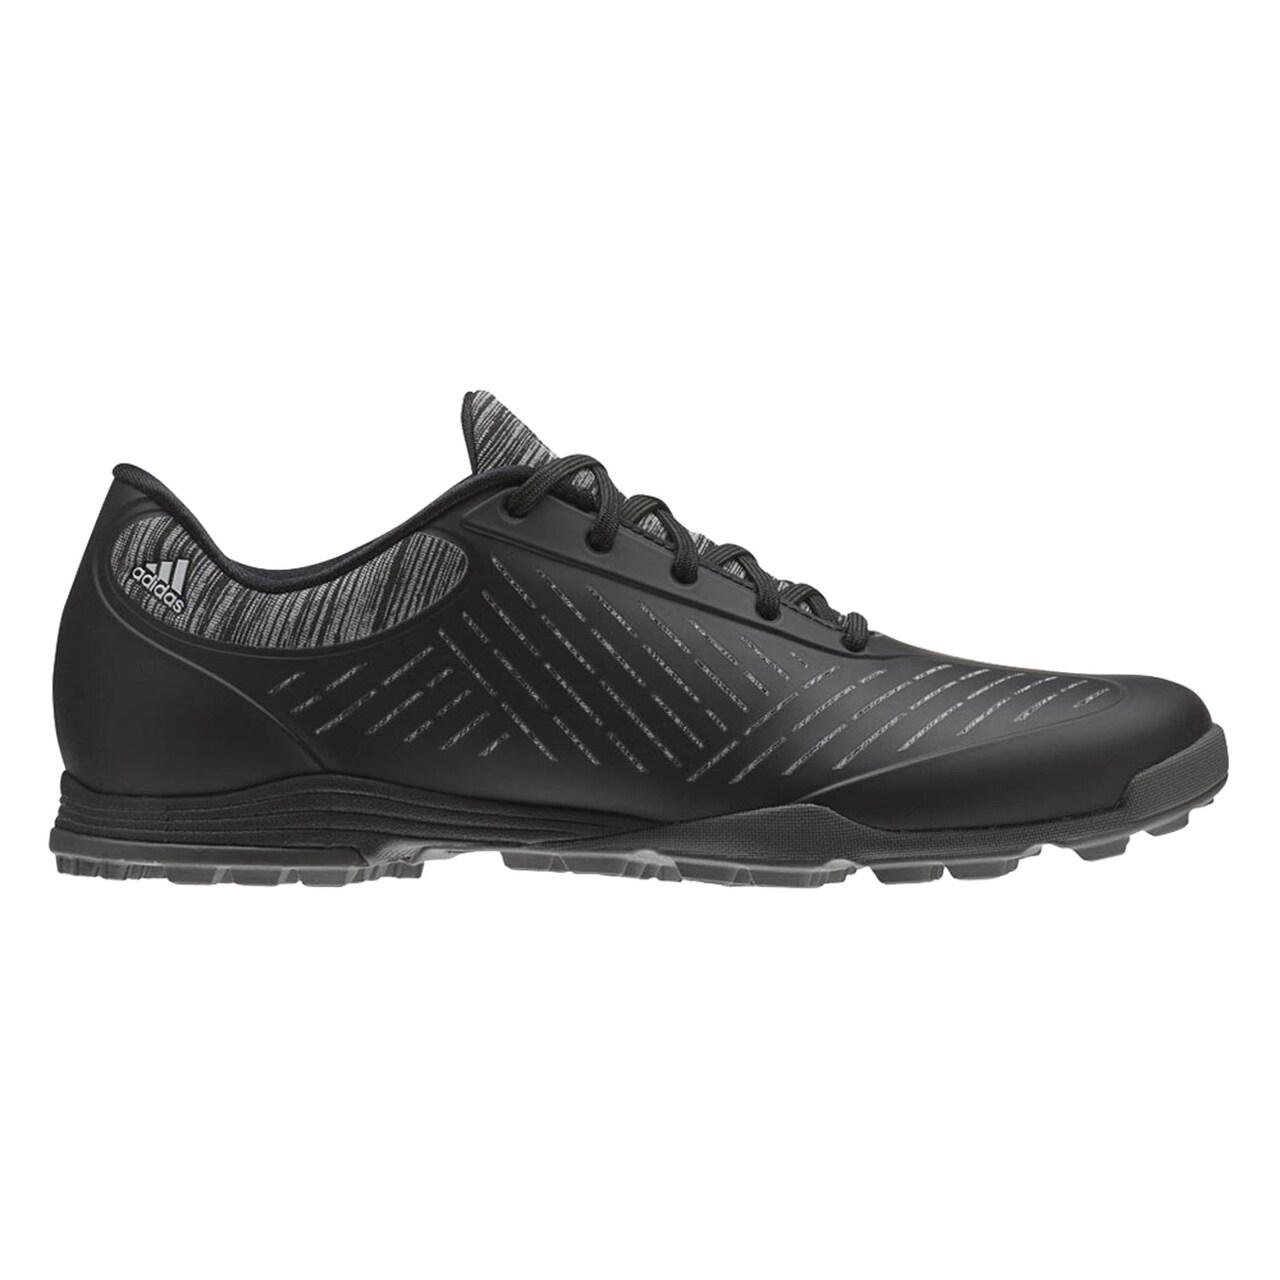 Adidas Women's Adipure Sport 2 Black/Grey/Silver Met Golf Shoes BB8012